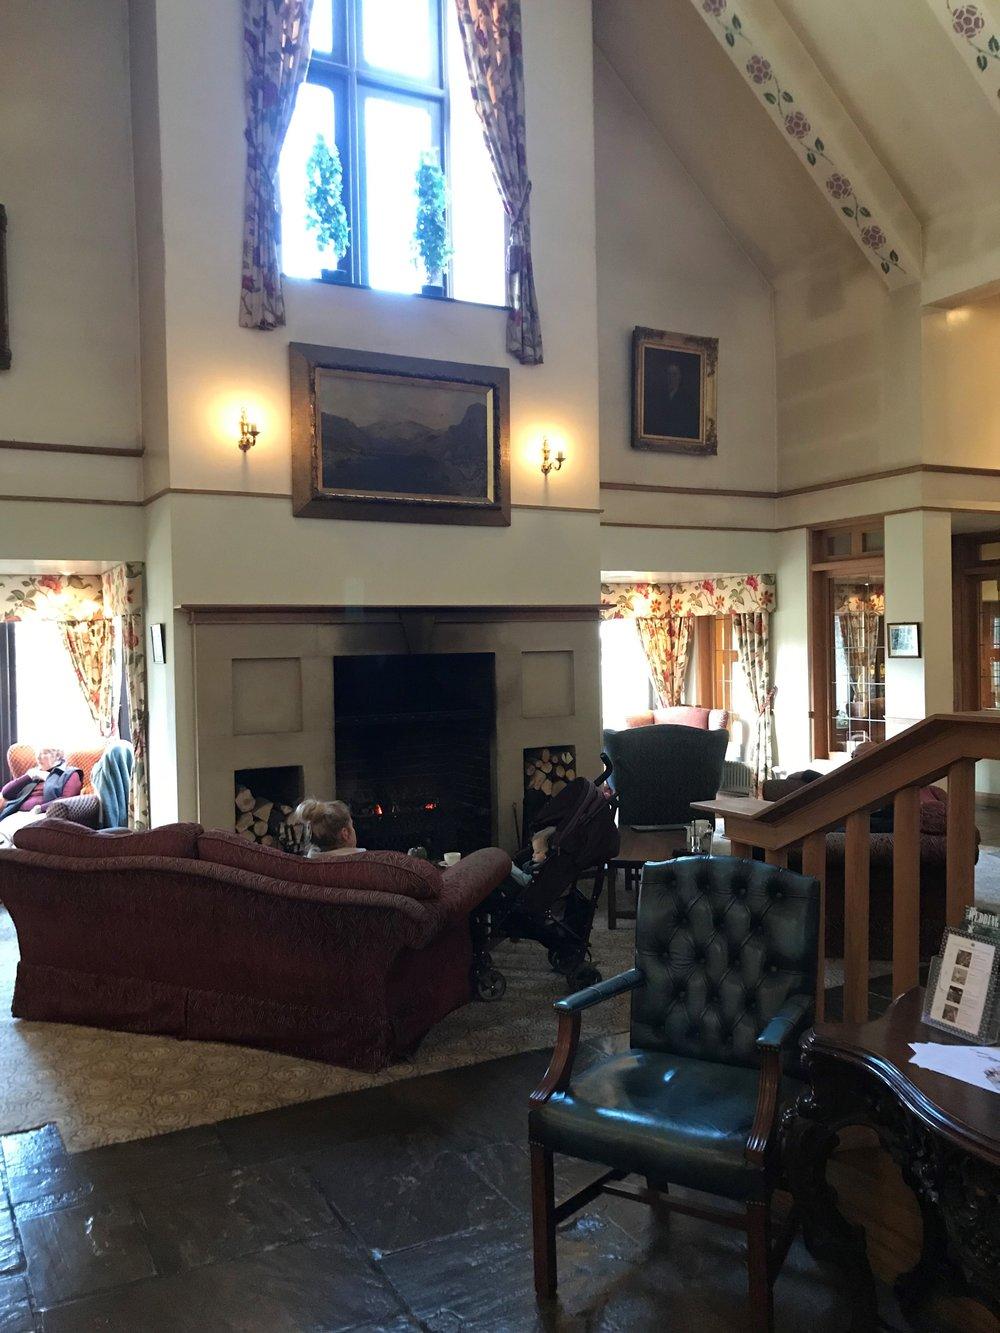 Lancaster House Hotel, Lancaster University